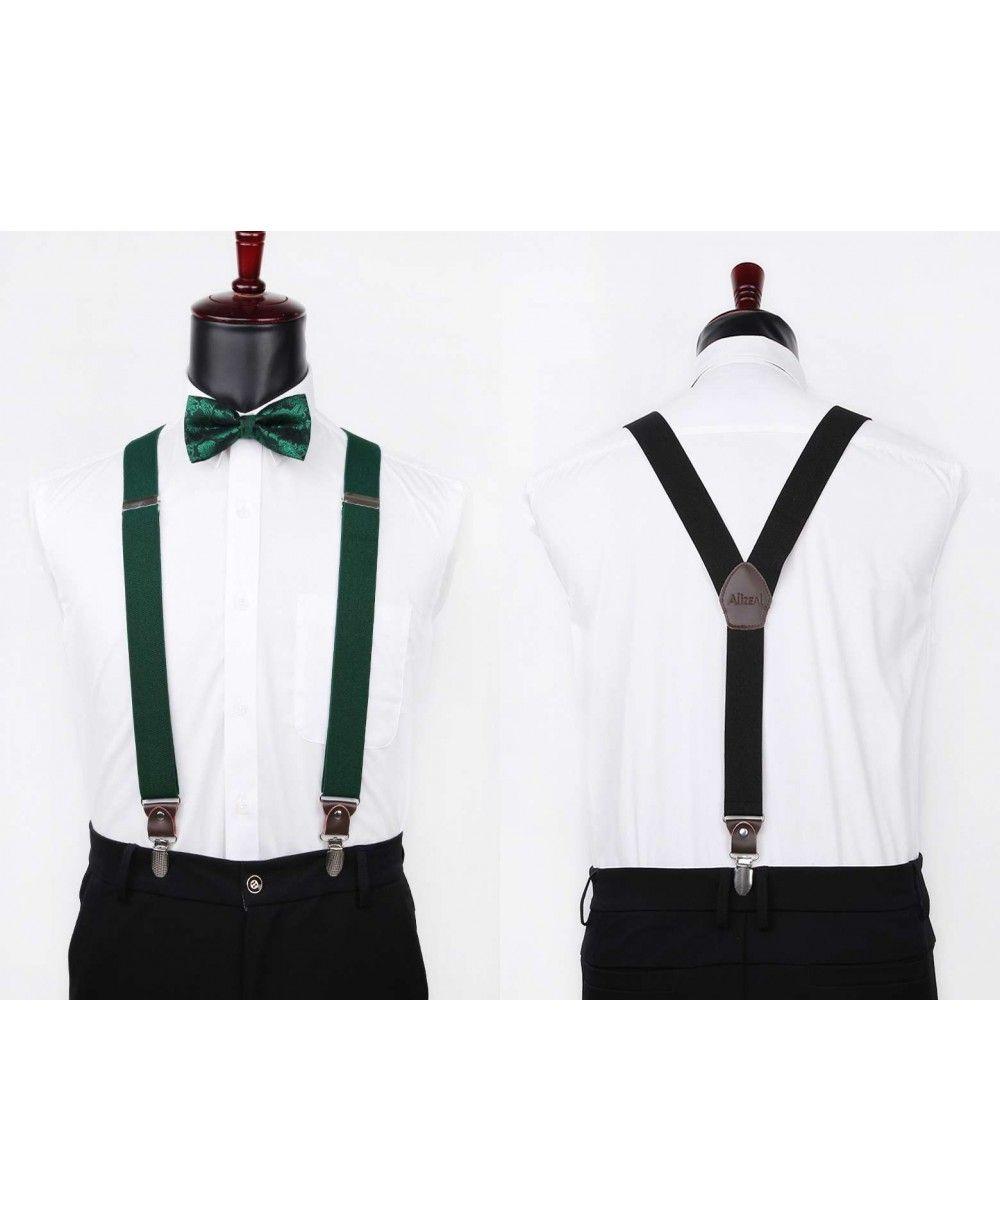 df0ae3992 Alizeal Mens Paisley Bow Tie and 3.5cm Wide 3-clip Suspenders Set 060-Dark  Green - Suspender